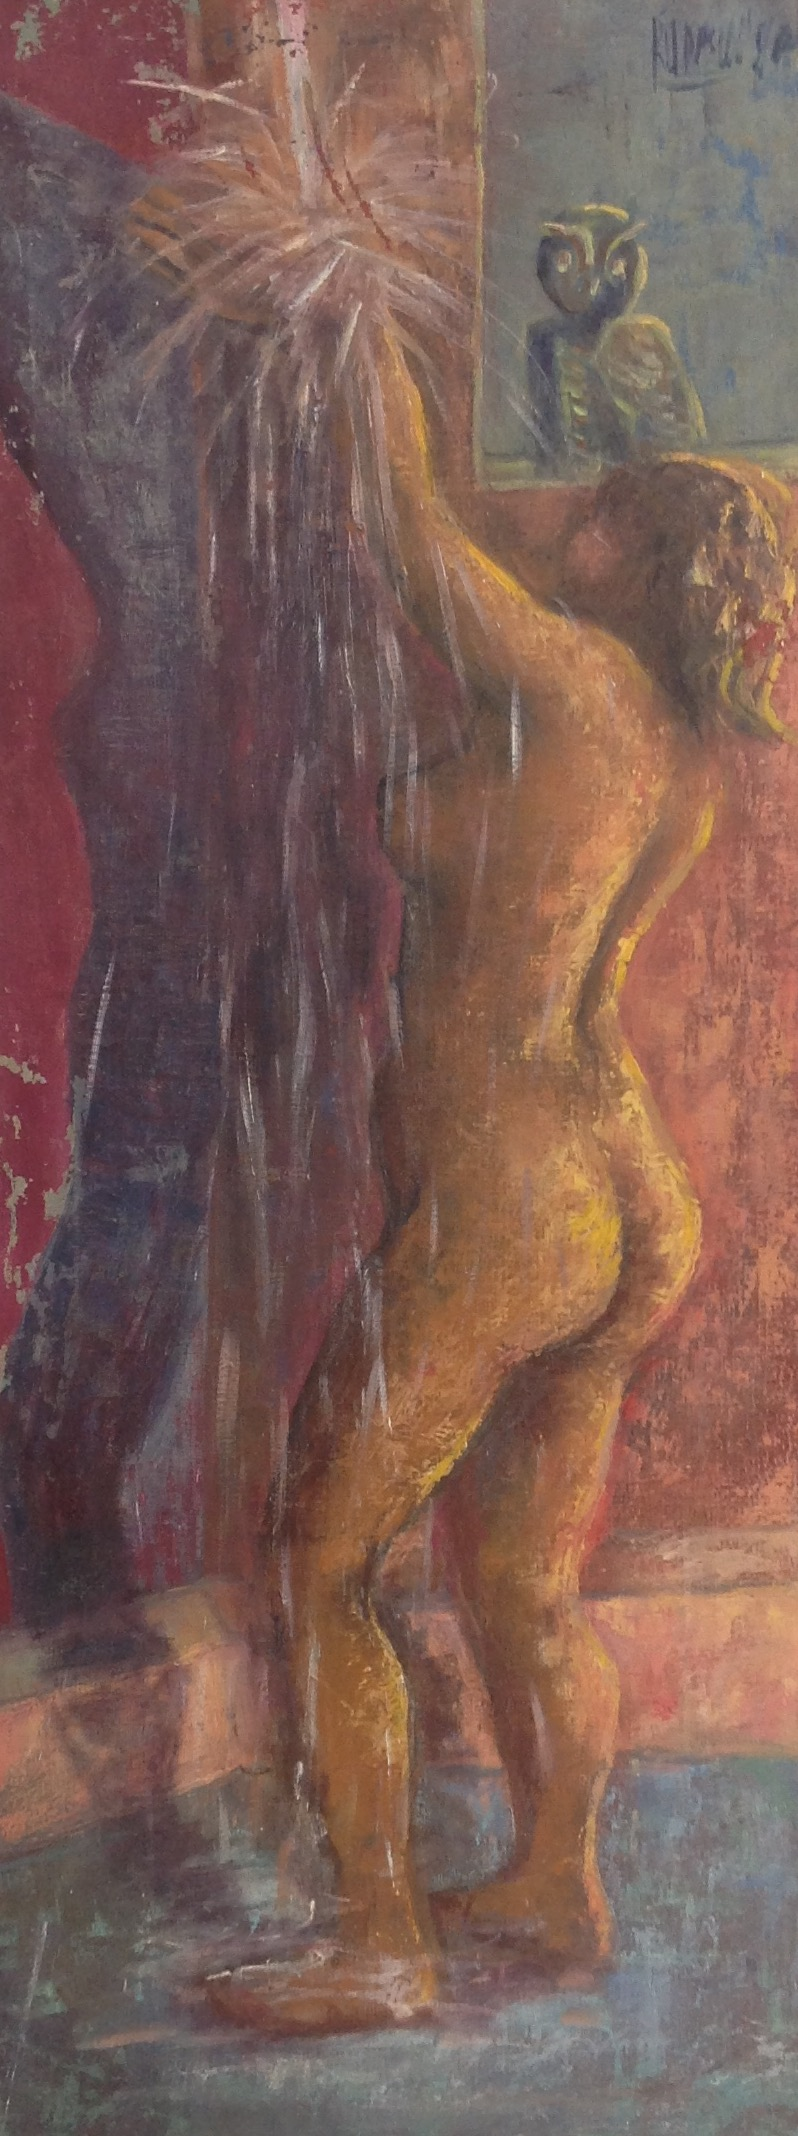 Desruisseau Rose Marie 14X36 #11-3-96 canvas